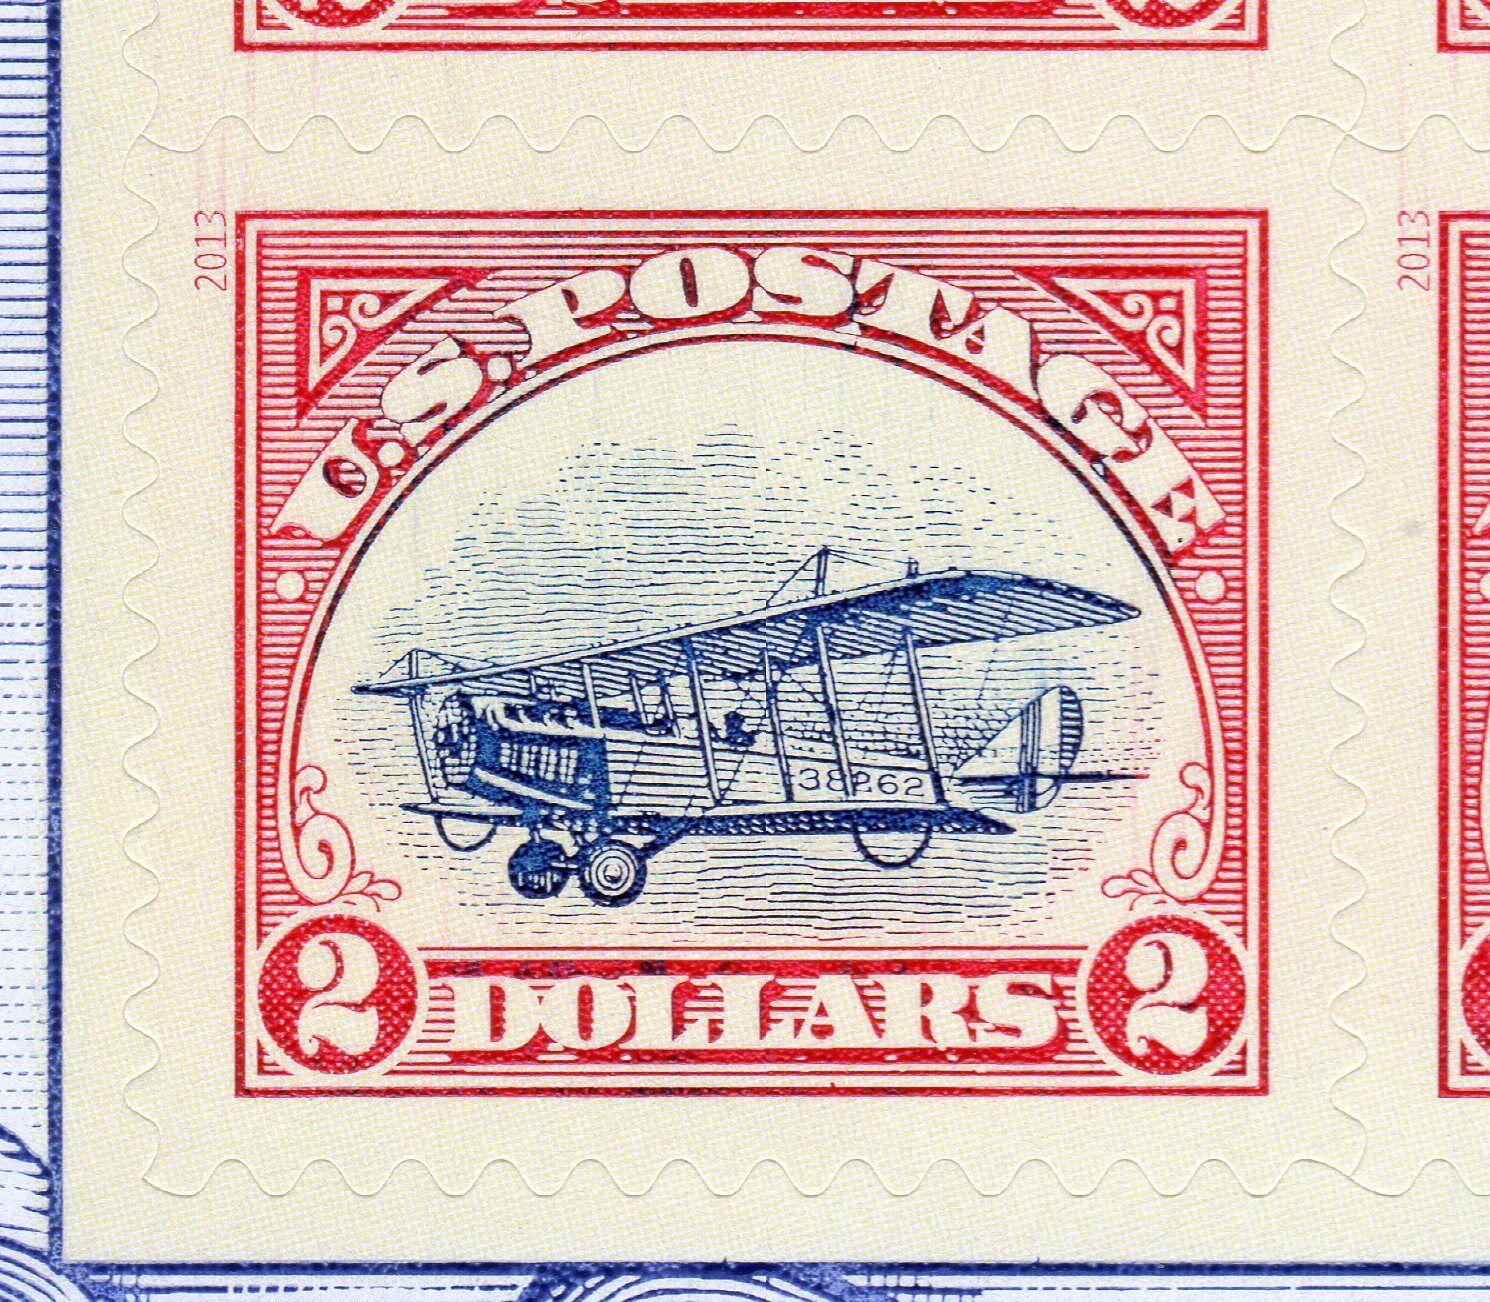 US # 4806d (2013) $2(x6) MNH - S98 w/PSE Cert- Un- INVERTED CENTER - Rare/Scarce